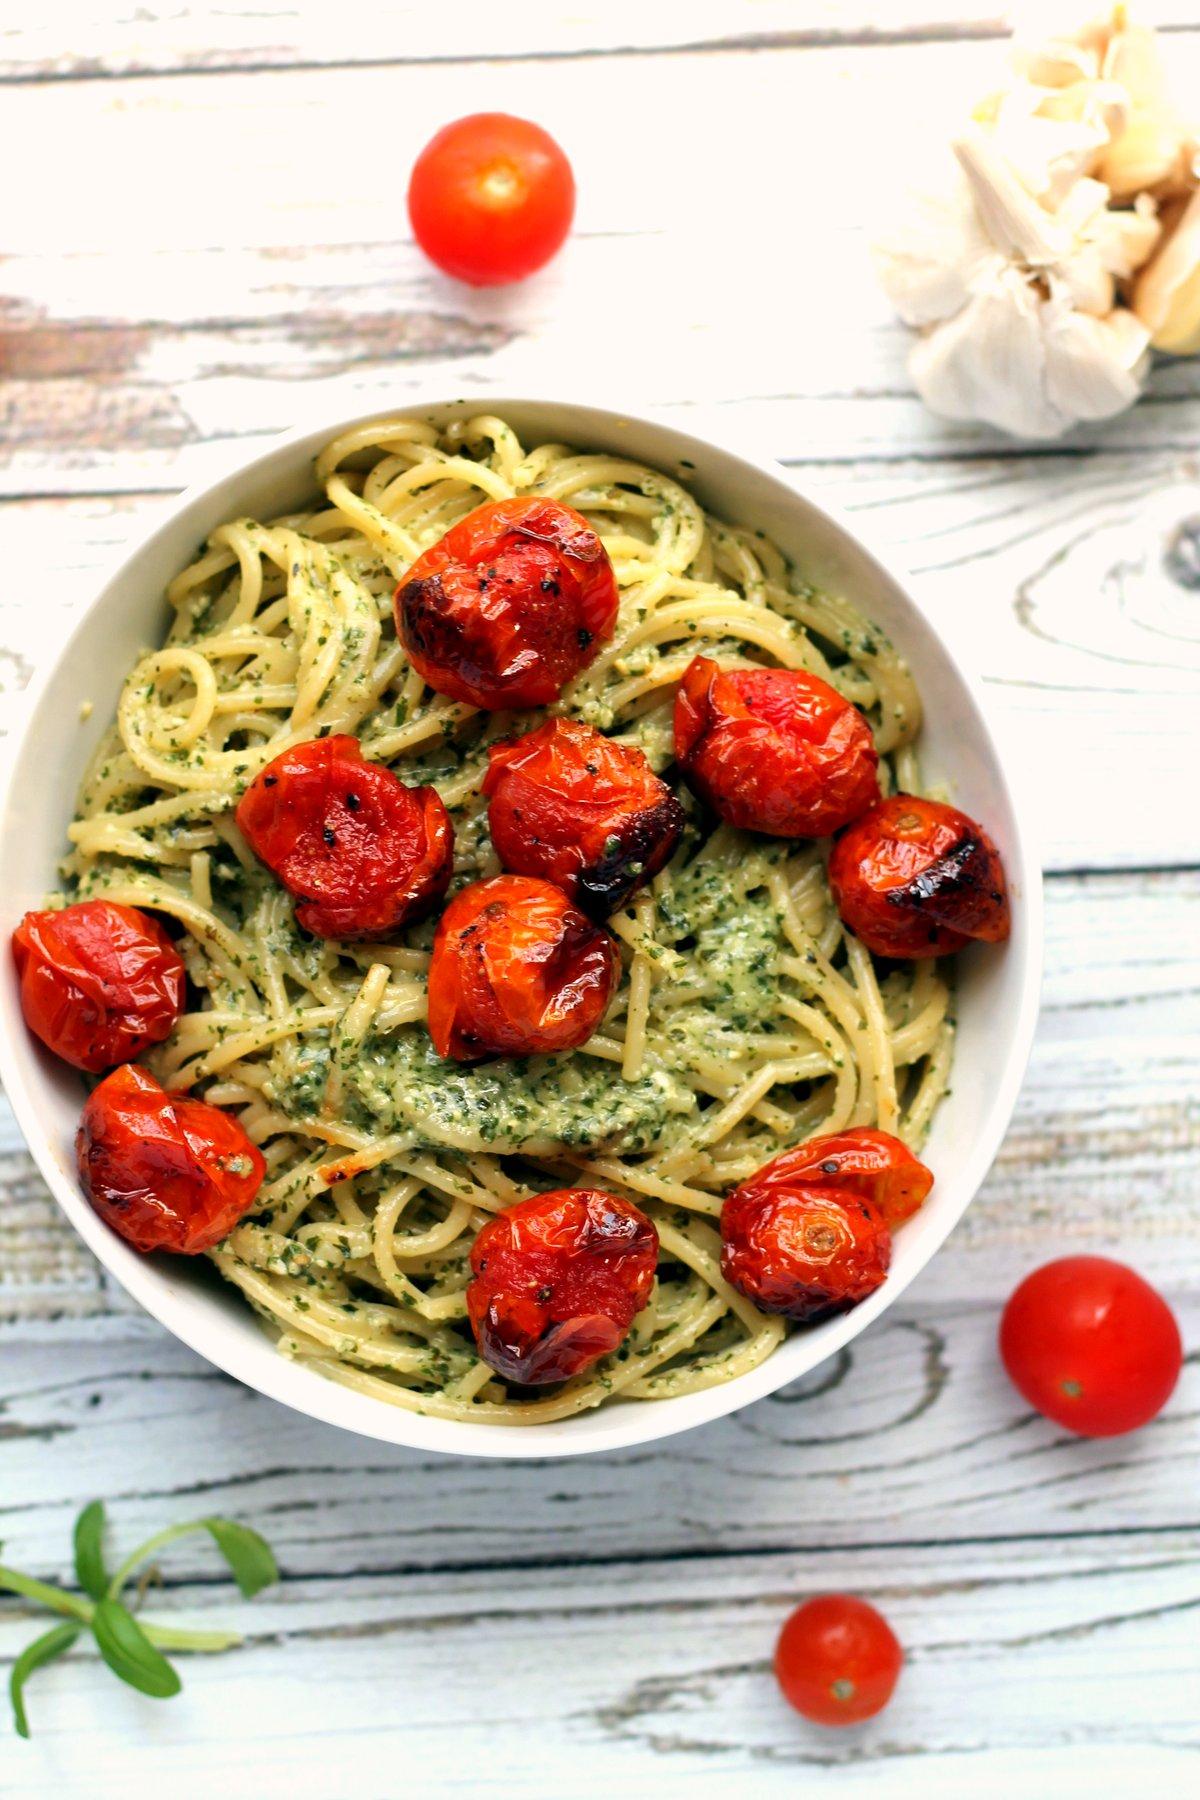 ... garlic pesto spaghetti with blistered cherry tomatoes - Ciao Veggie